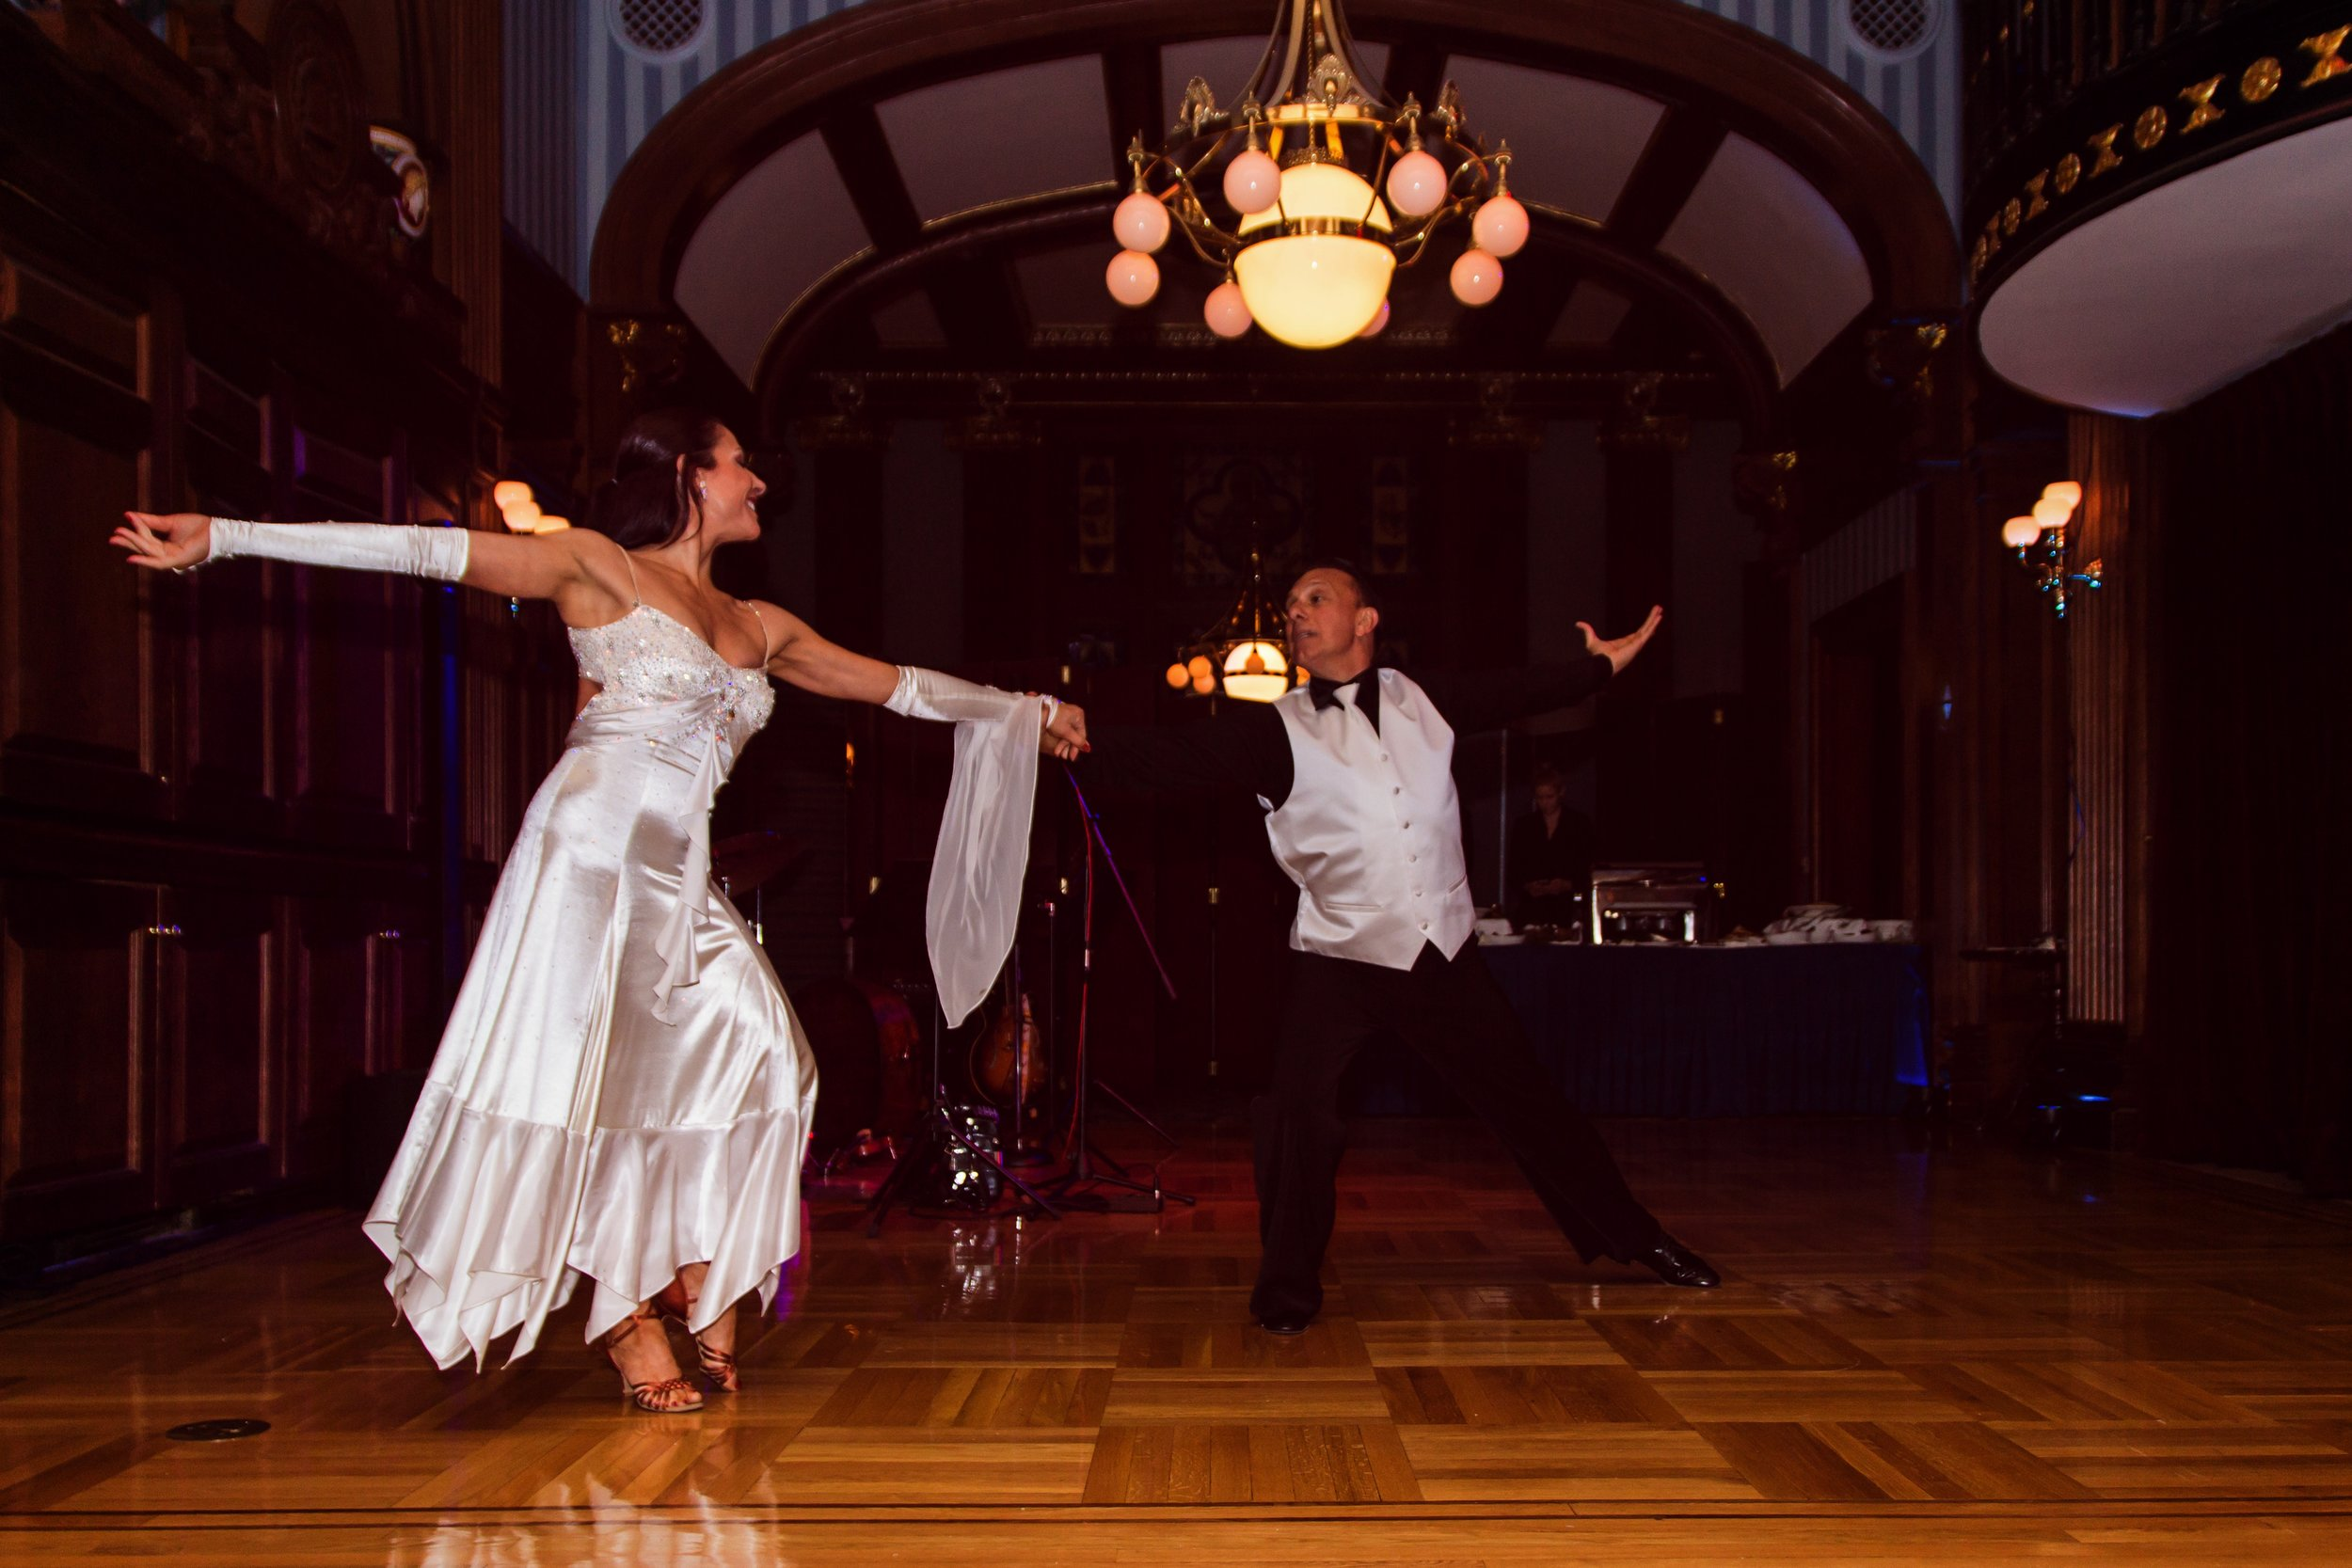 Graceful dancers captivate guests